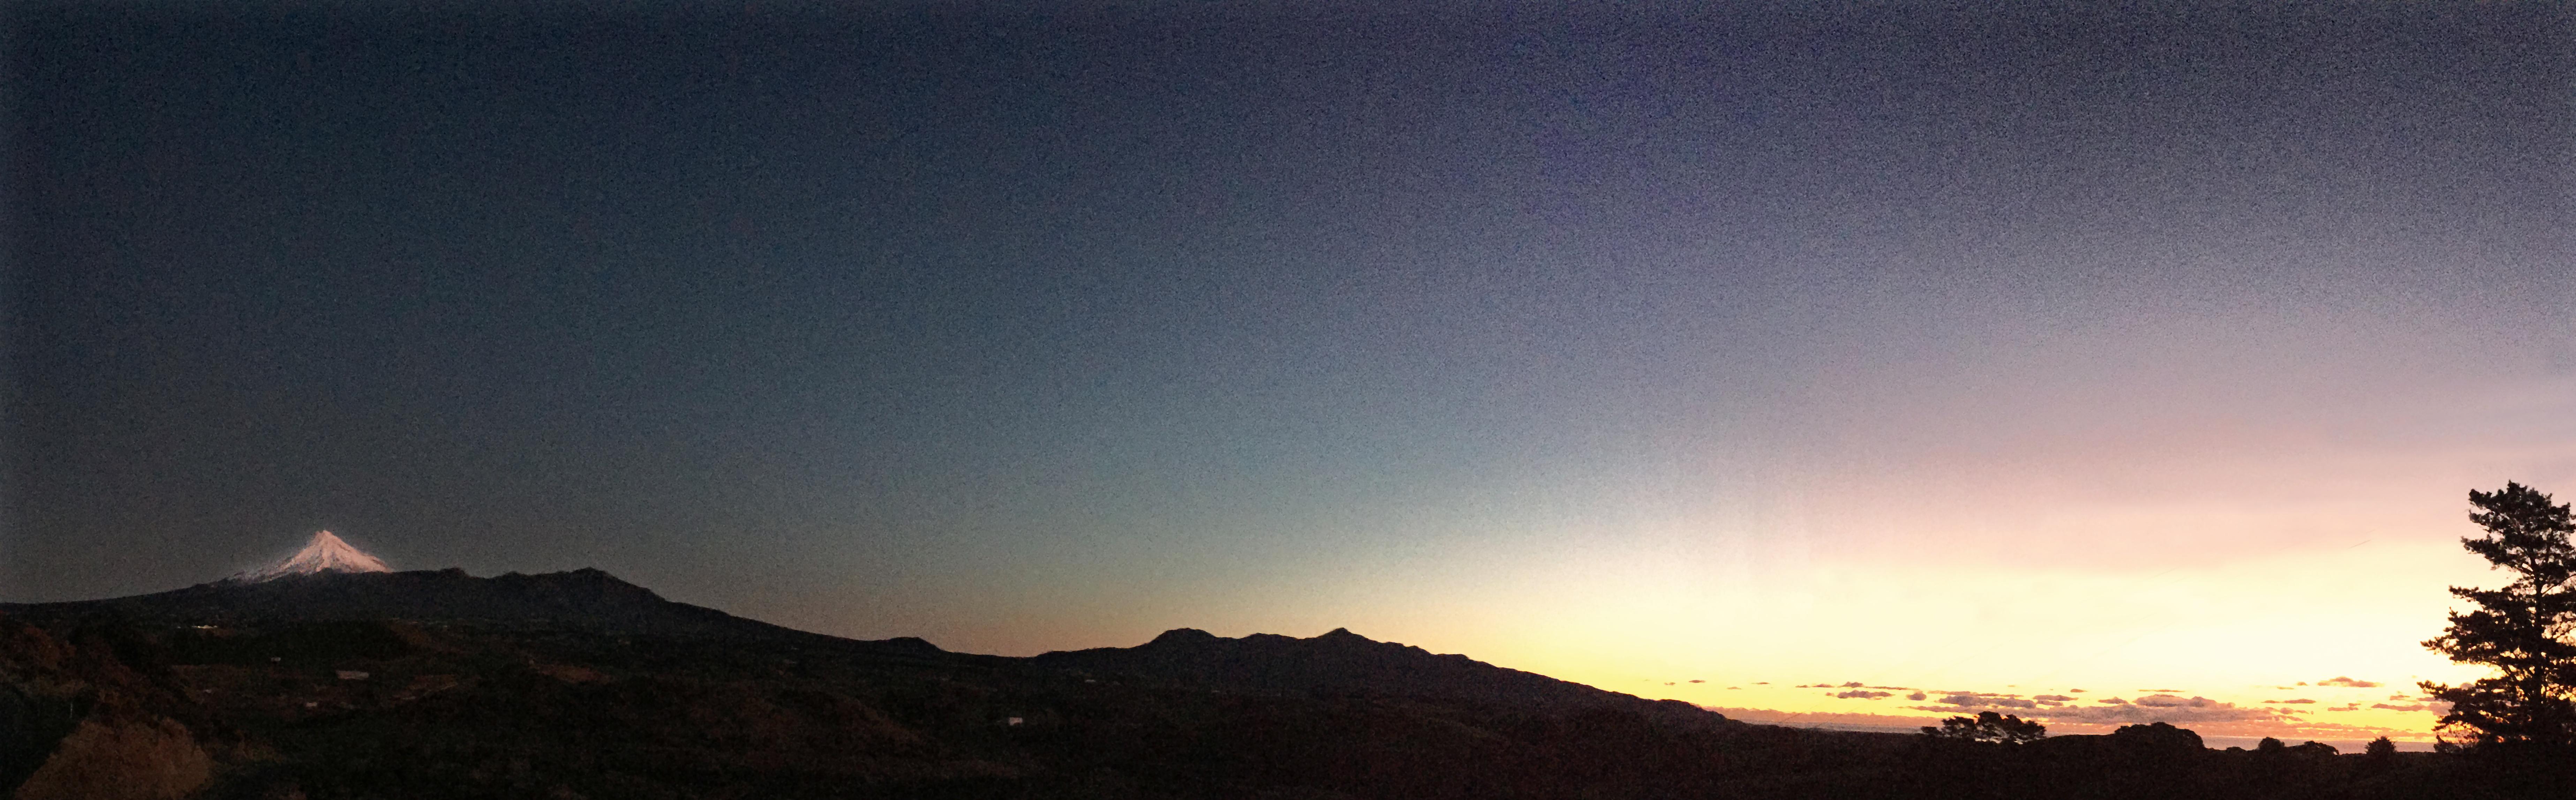 Evening Mt July 2015